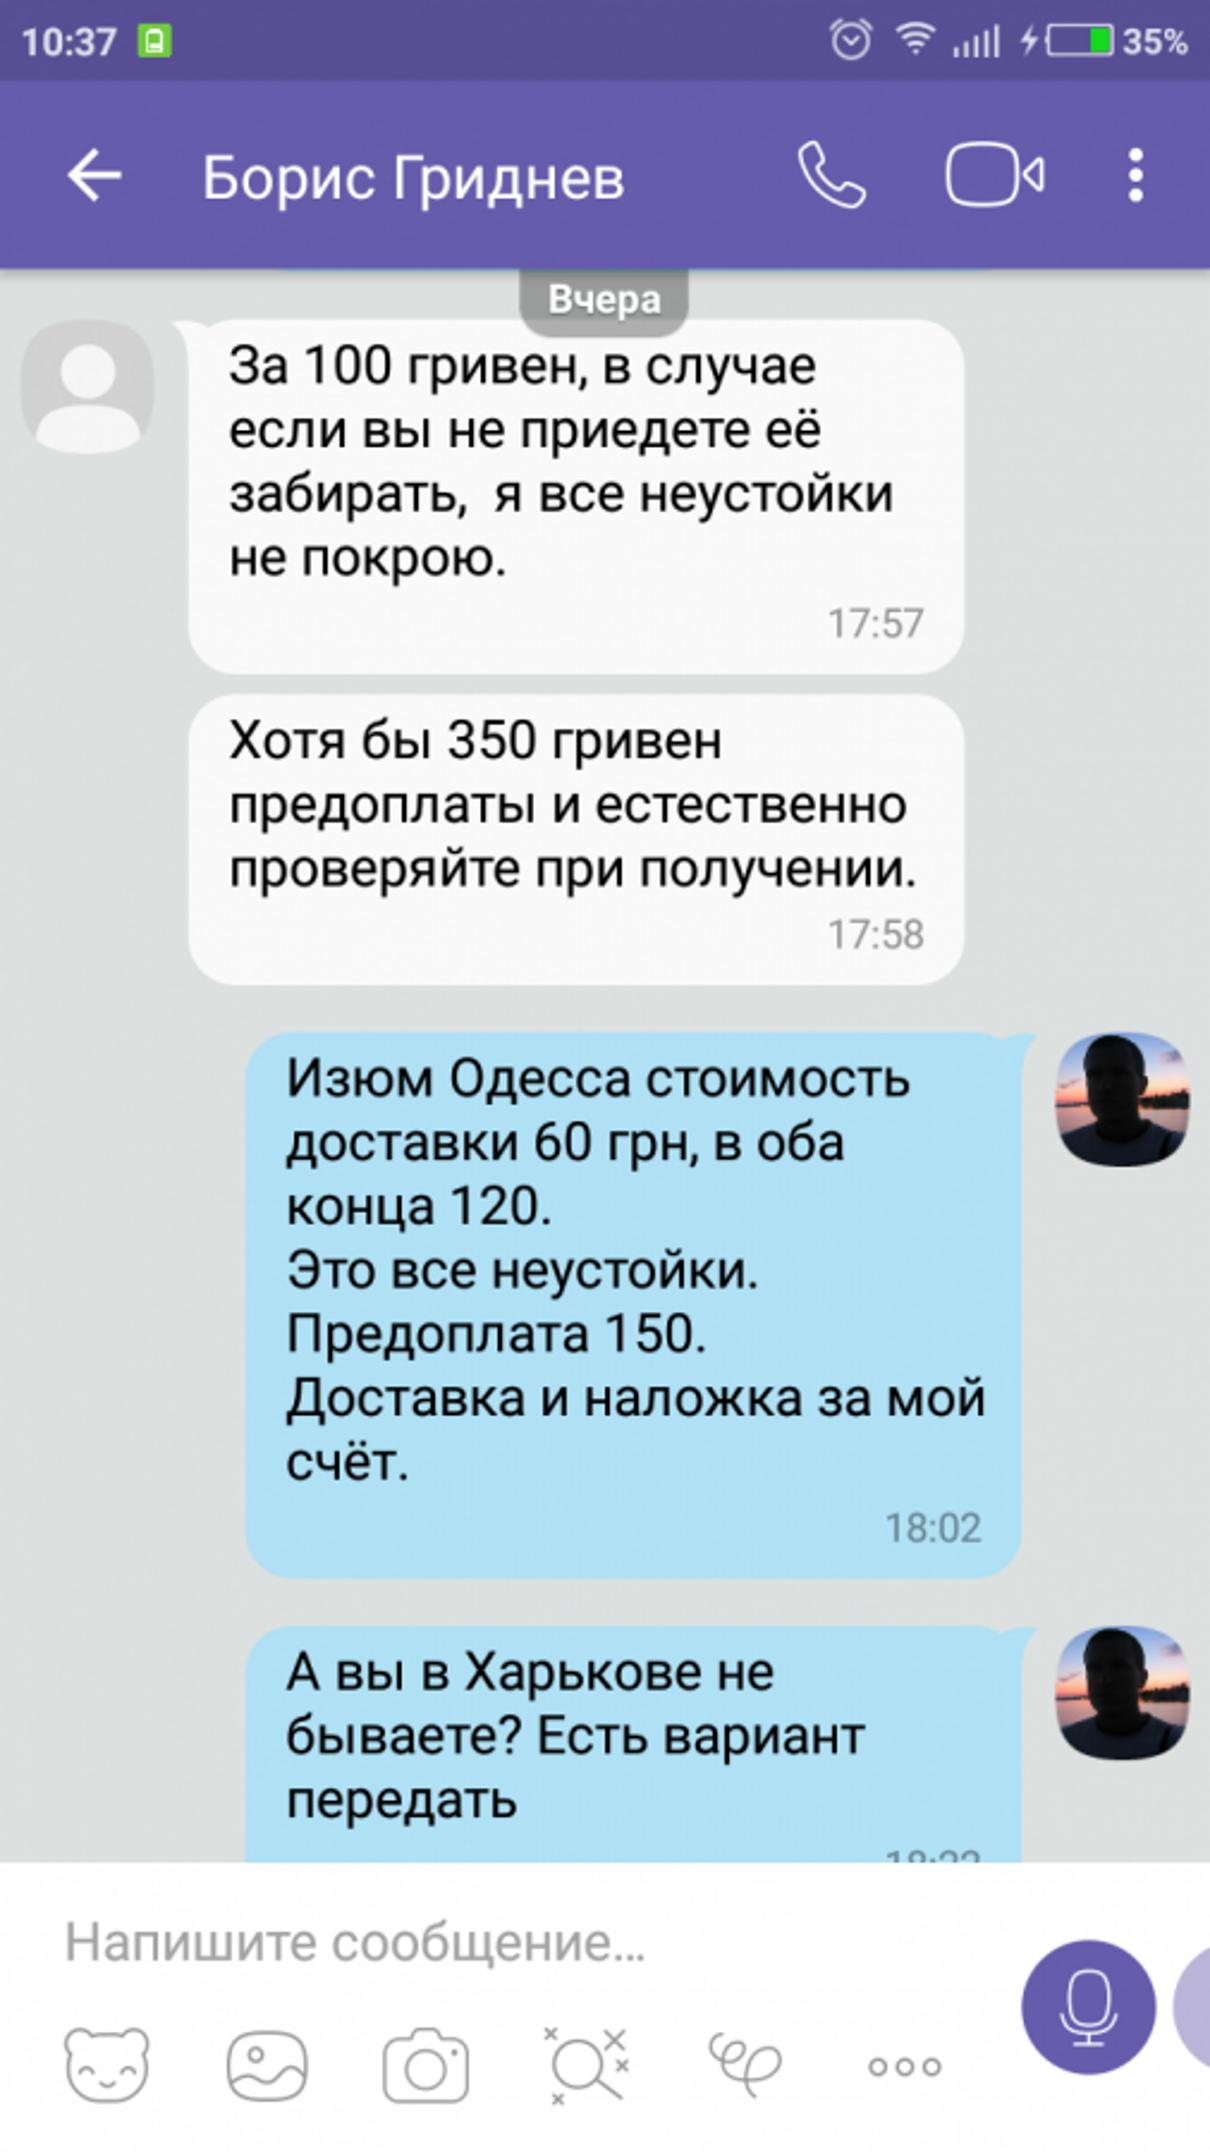 Жалоба-отзыв: Борис Гриднев - Мошенник с OLX, кидает на предоплату.  Фото №2